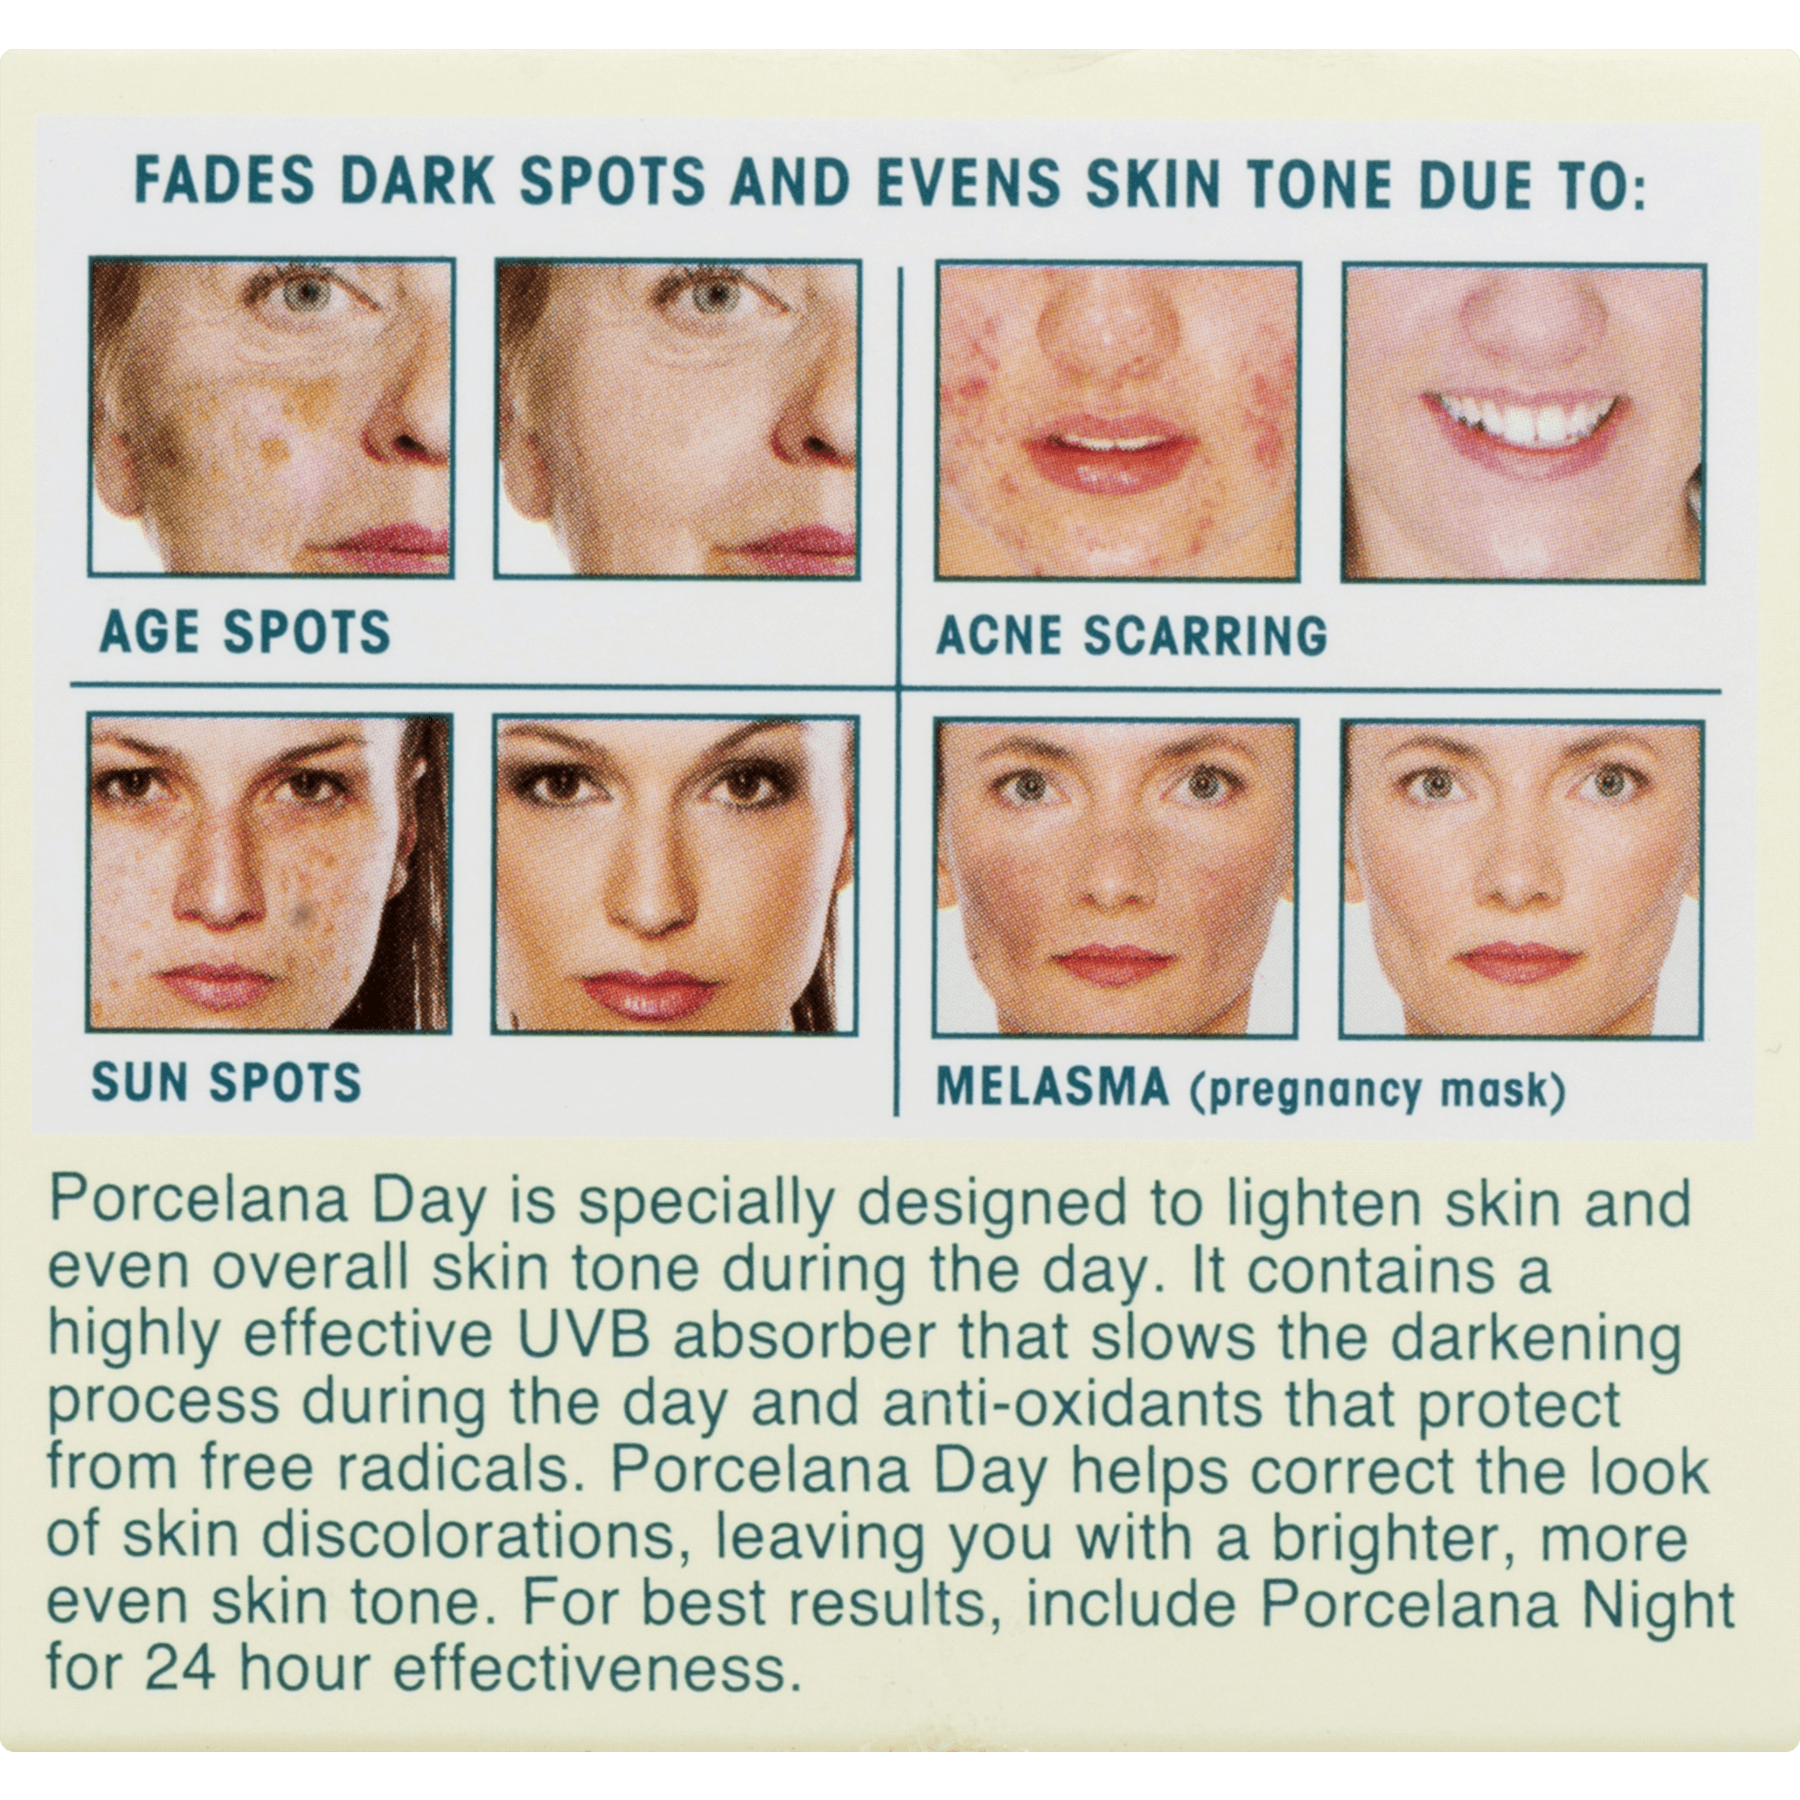 Porcelana Skin Lightening Day Cream and Fade Dark Spots Treatment 3